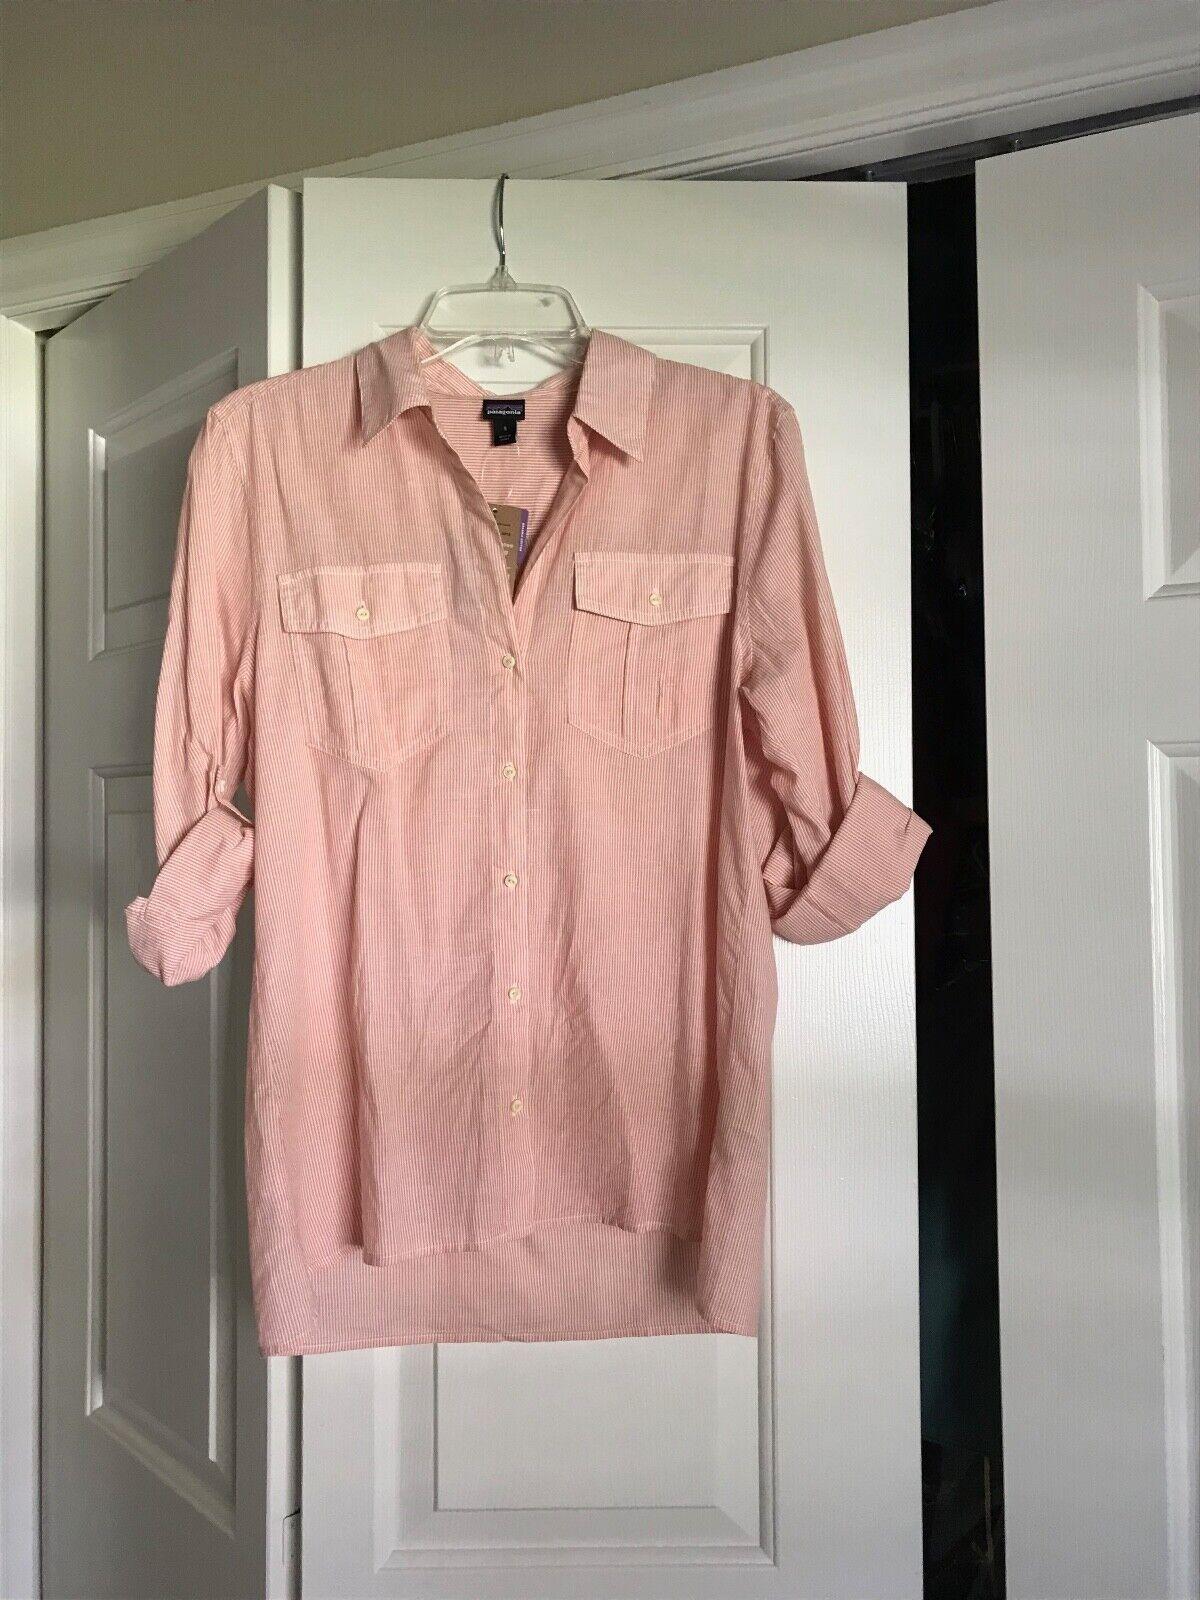 NWT Patagonia OrganIc Lightweight Buttondown Coral Thin Stripe Shirt in Größe S